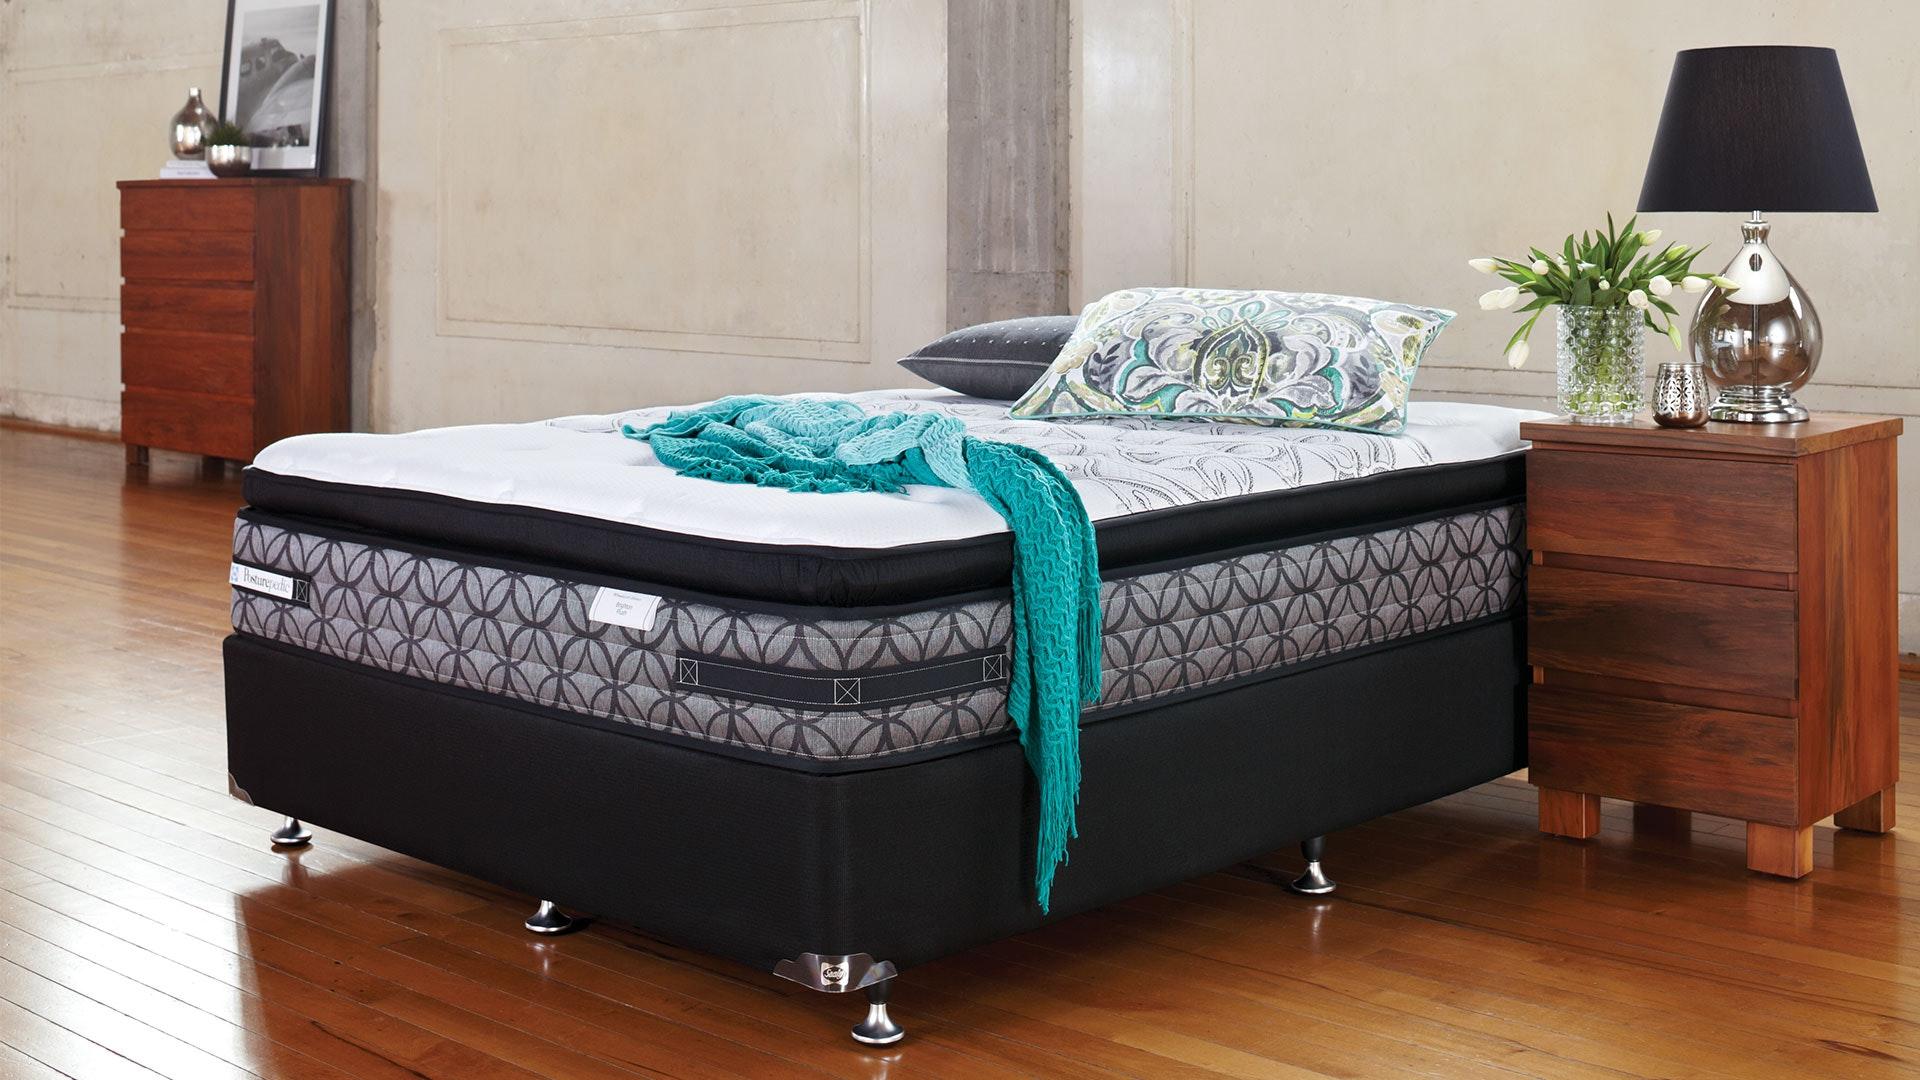 Brighton Plush Super King Bed by Sealy Posturepedic